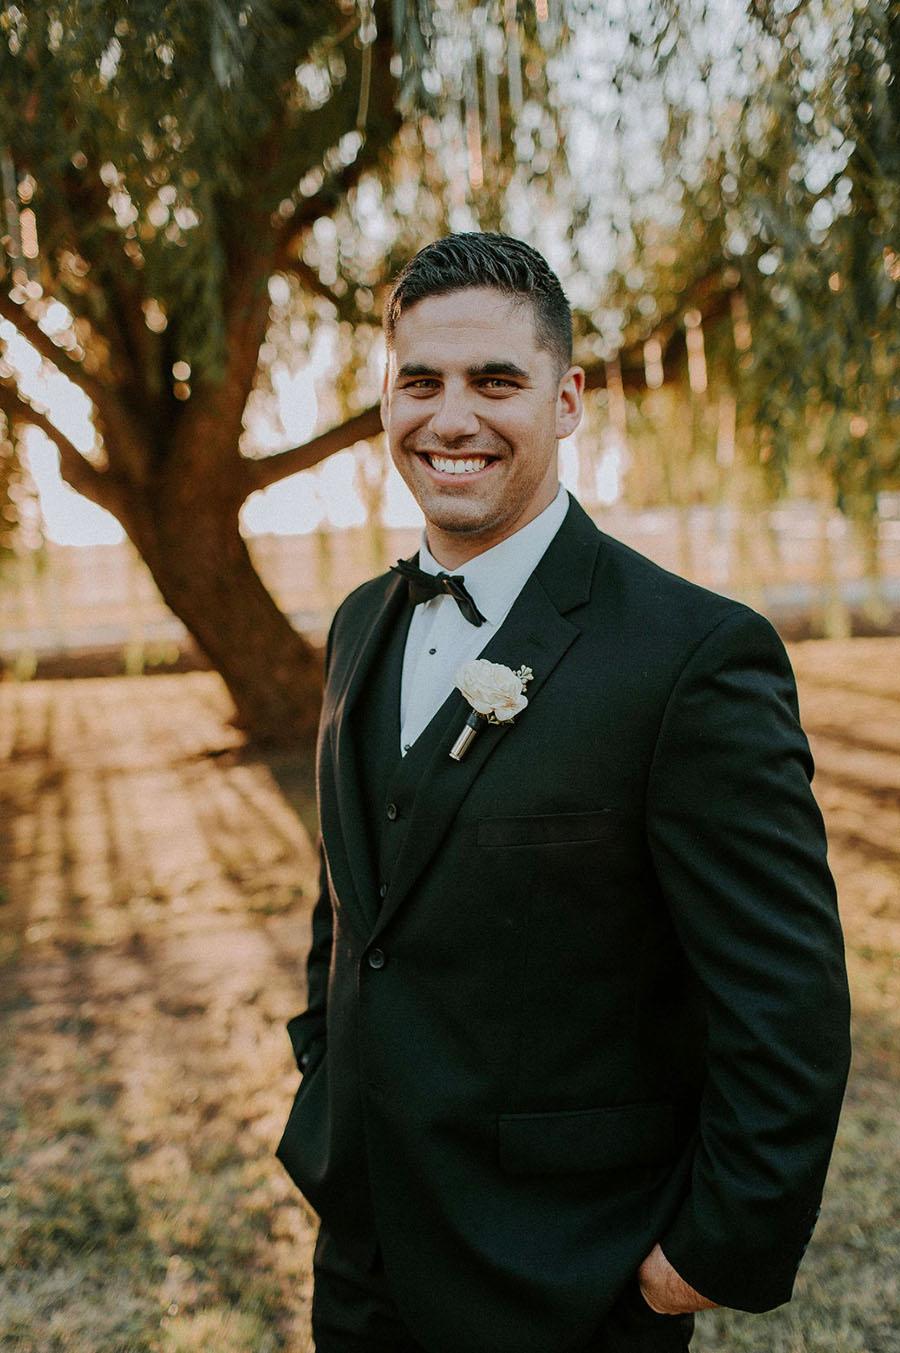 Stylish Black Tie Groom in a Three Piece Suit